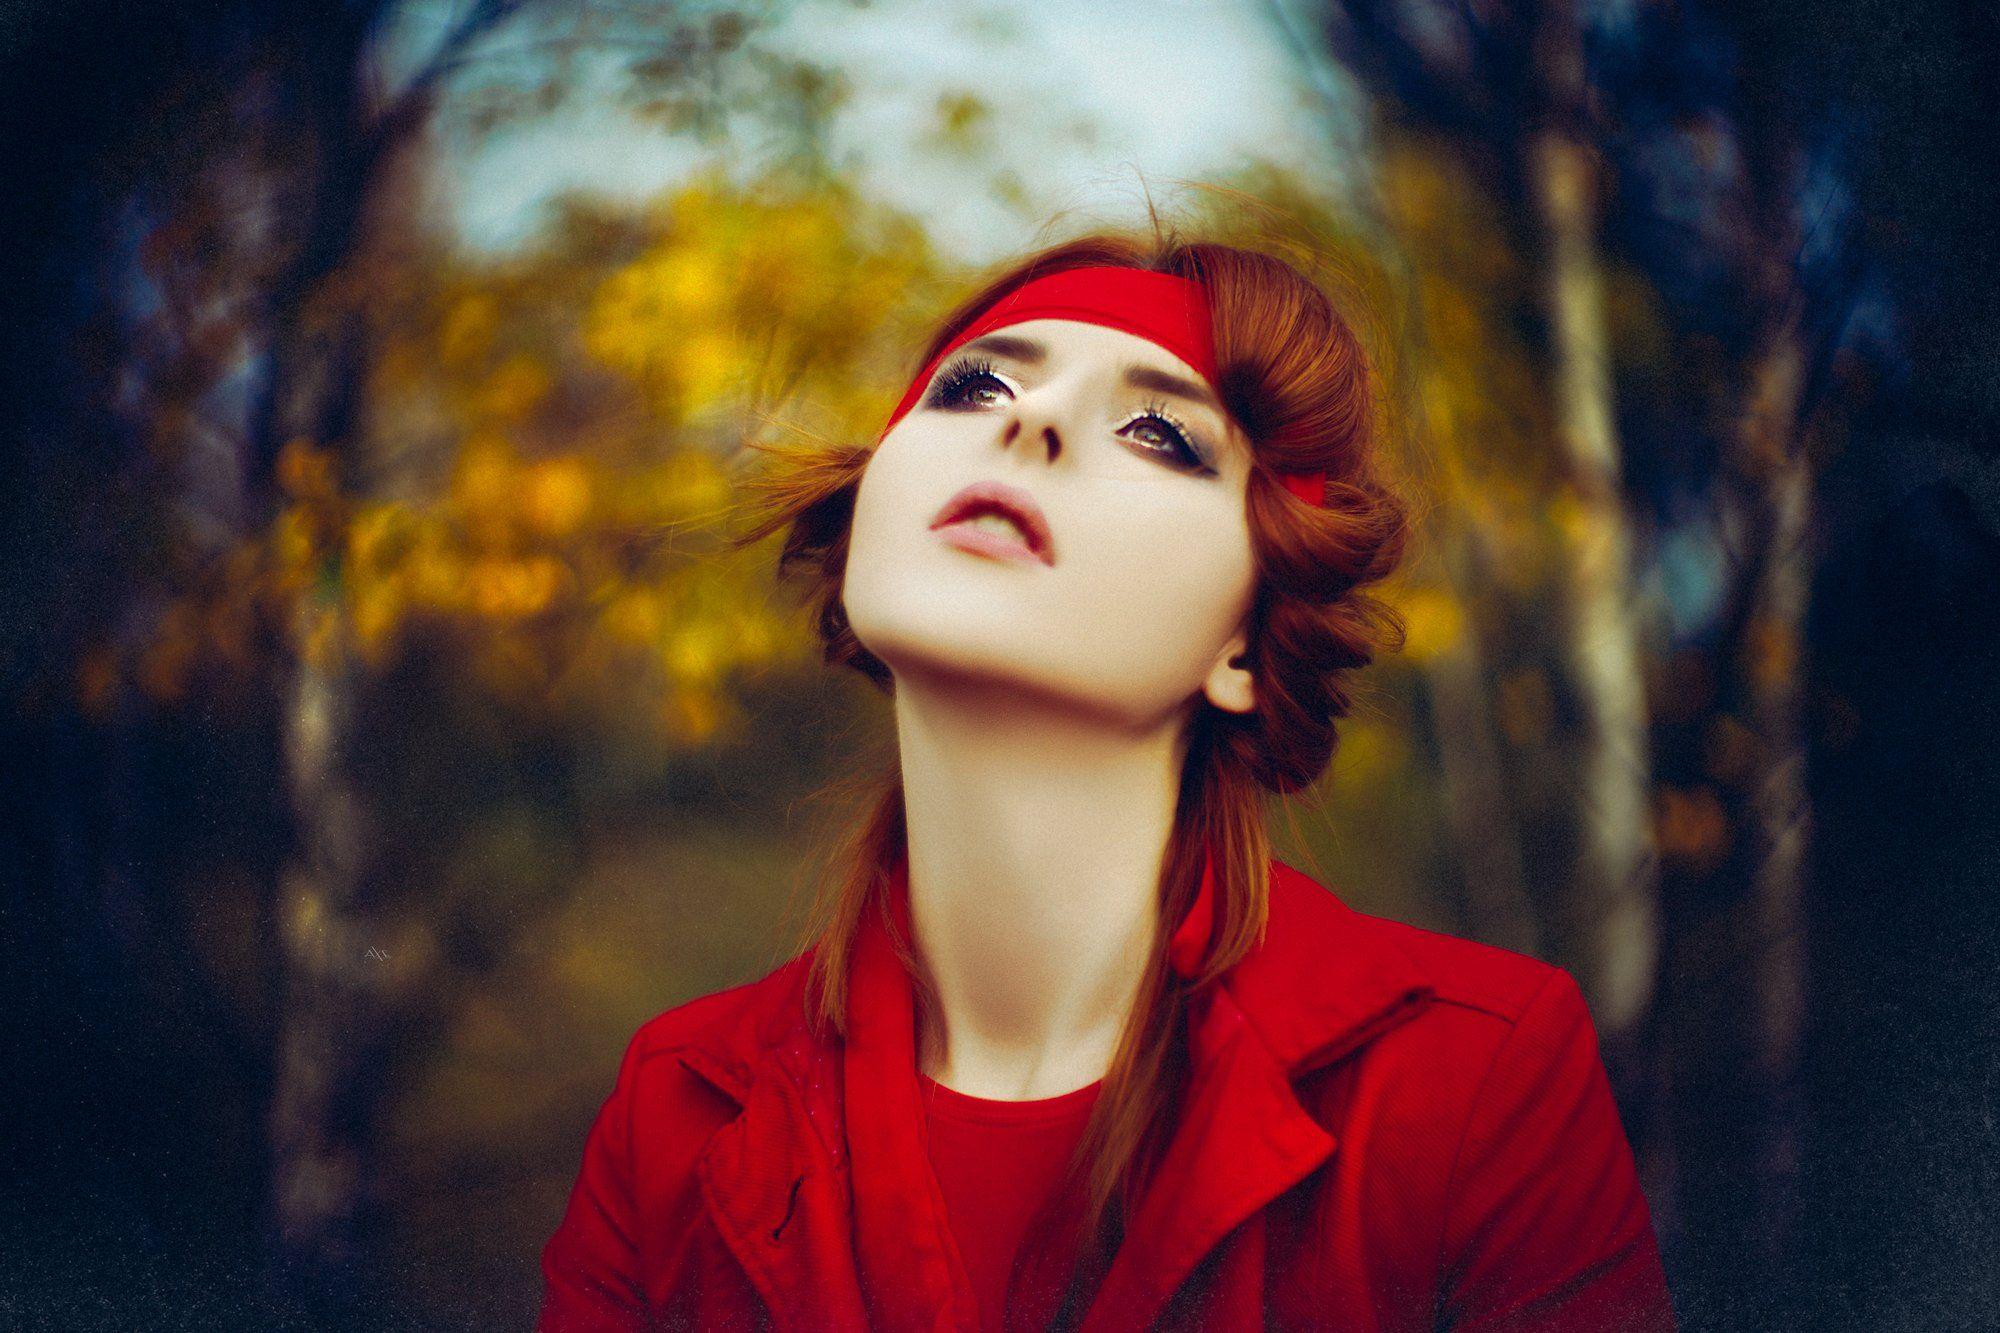 woman, portrait, natural light, art, bokeh, autumn, colors, Руслан Болгов (Axe)